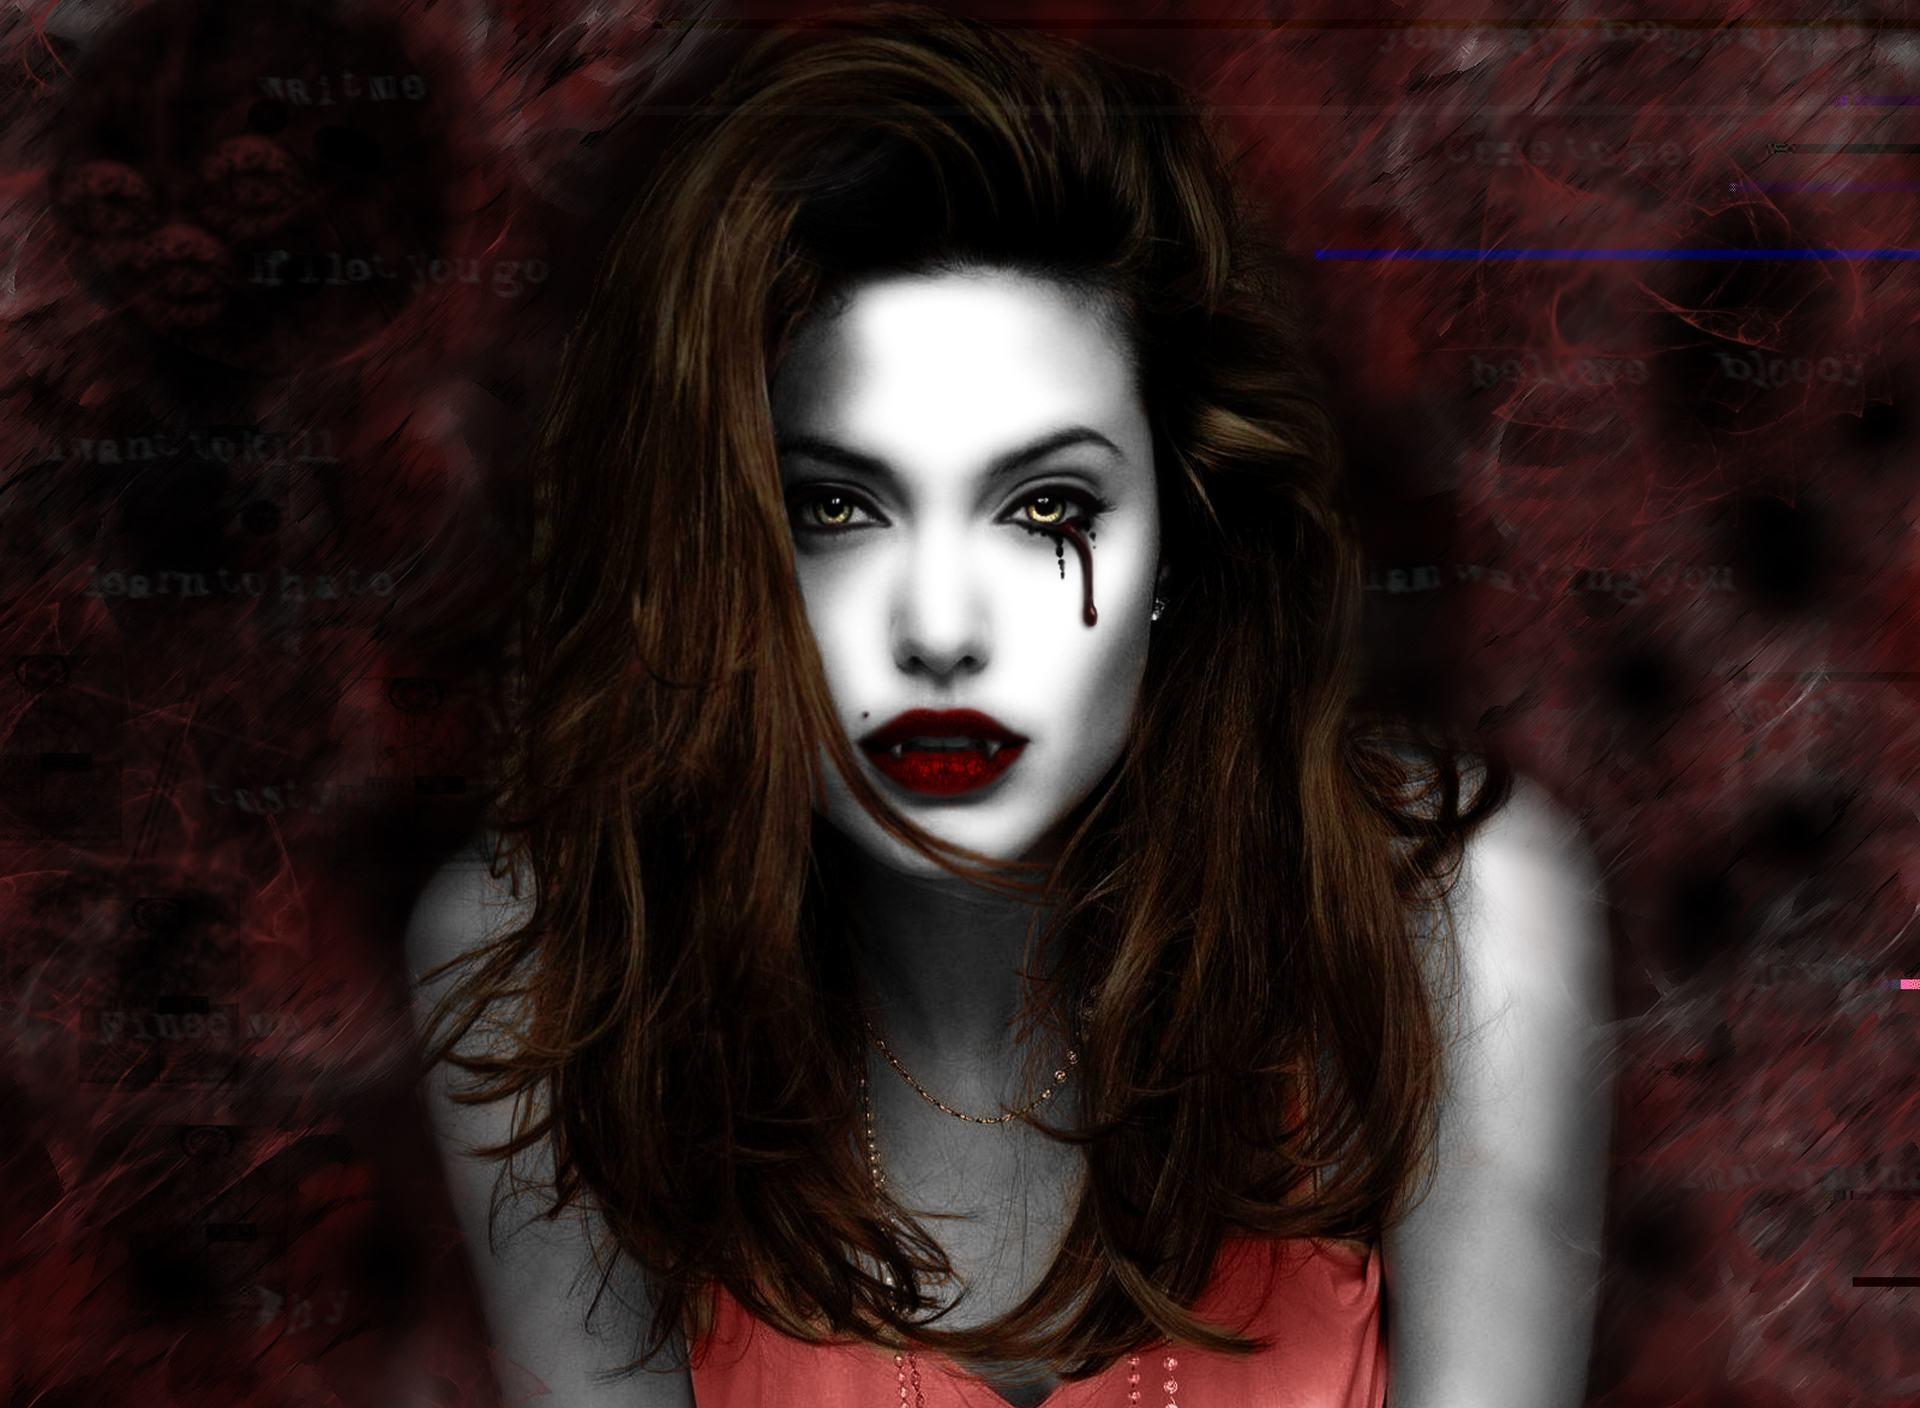 Vampire Wallpapers For Mobile